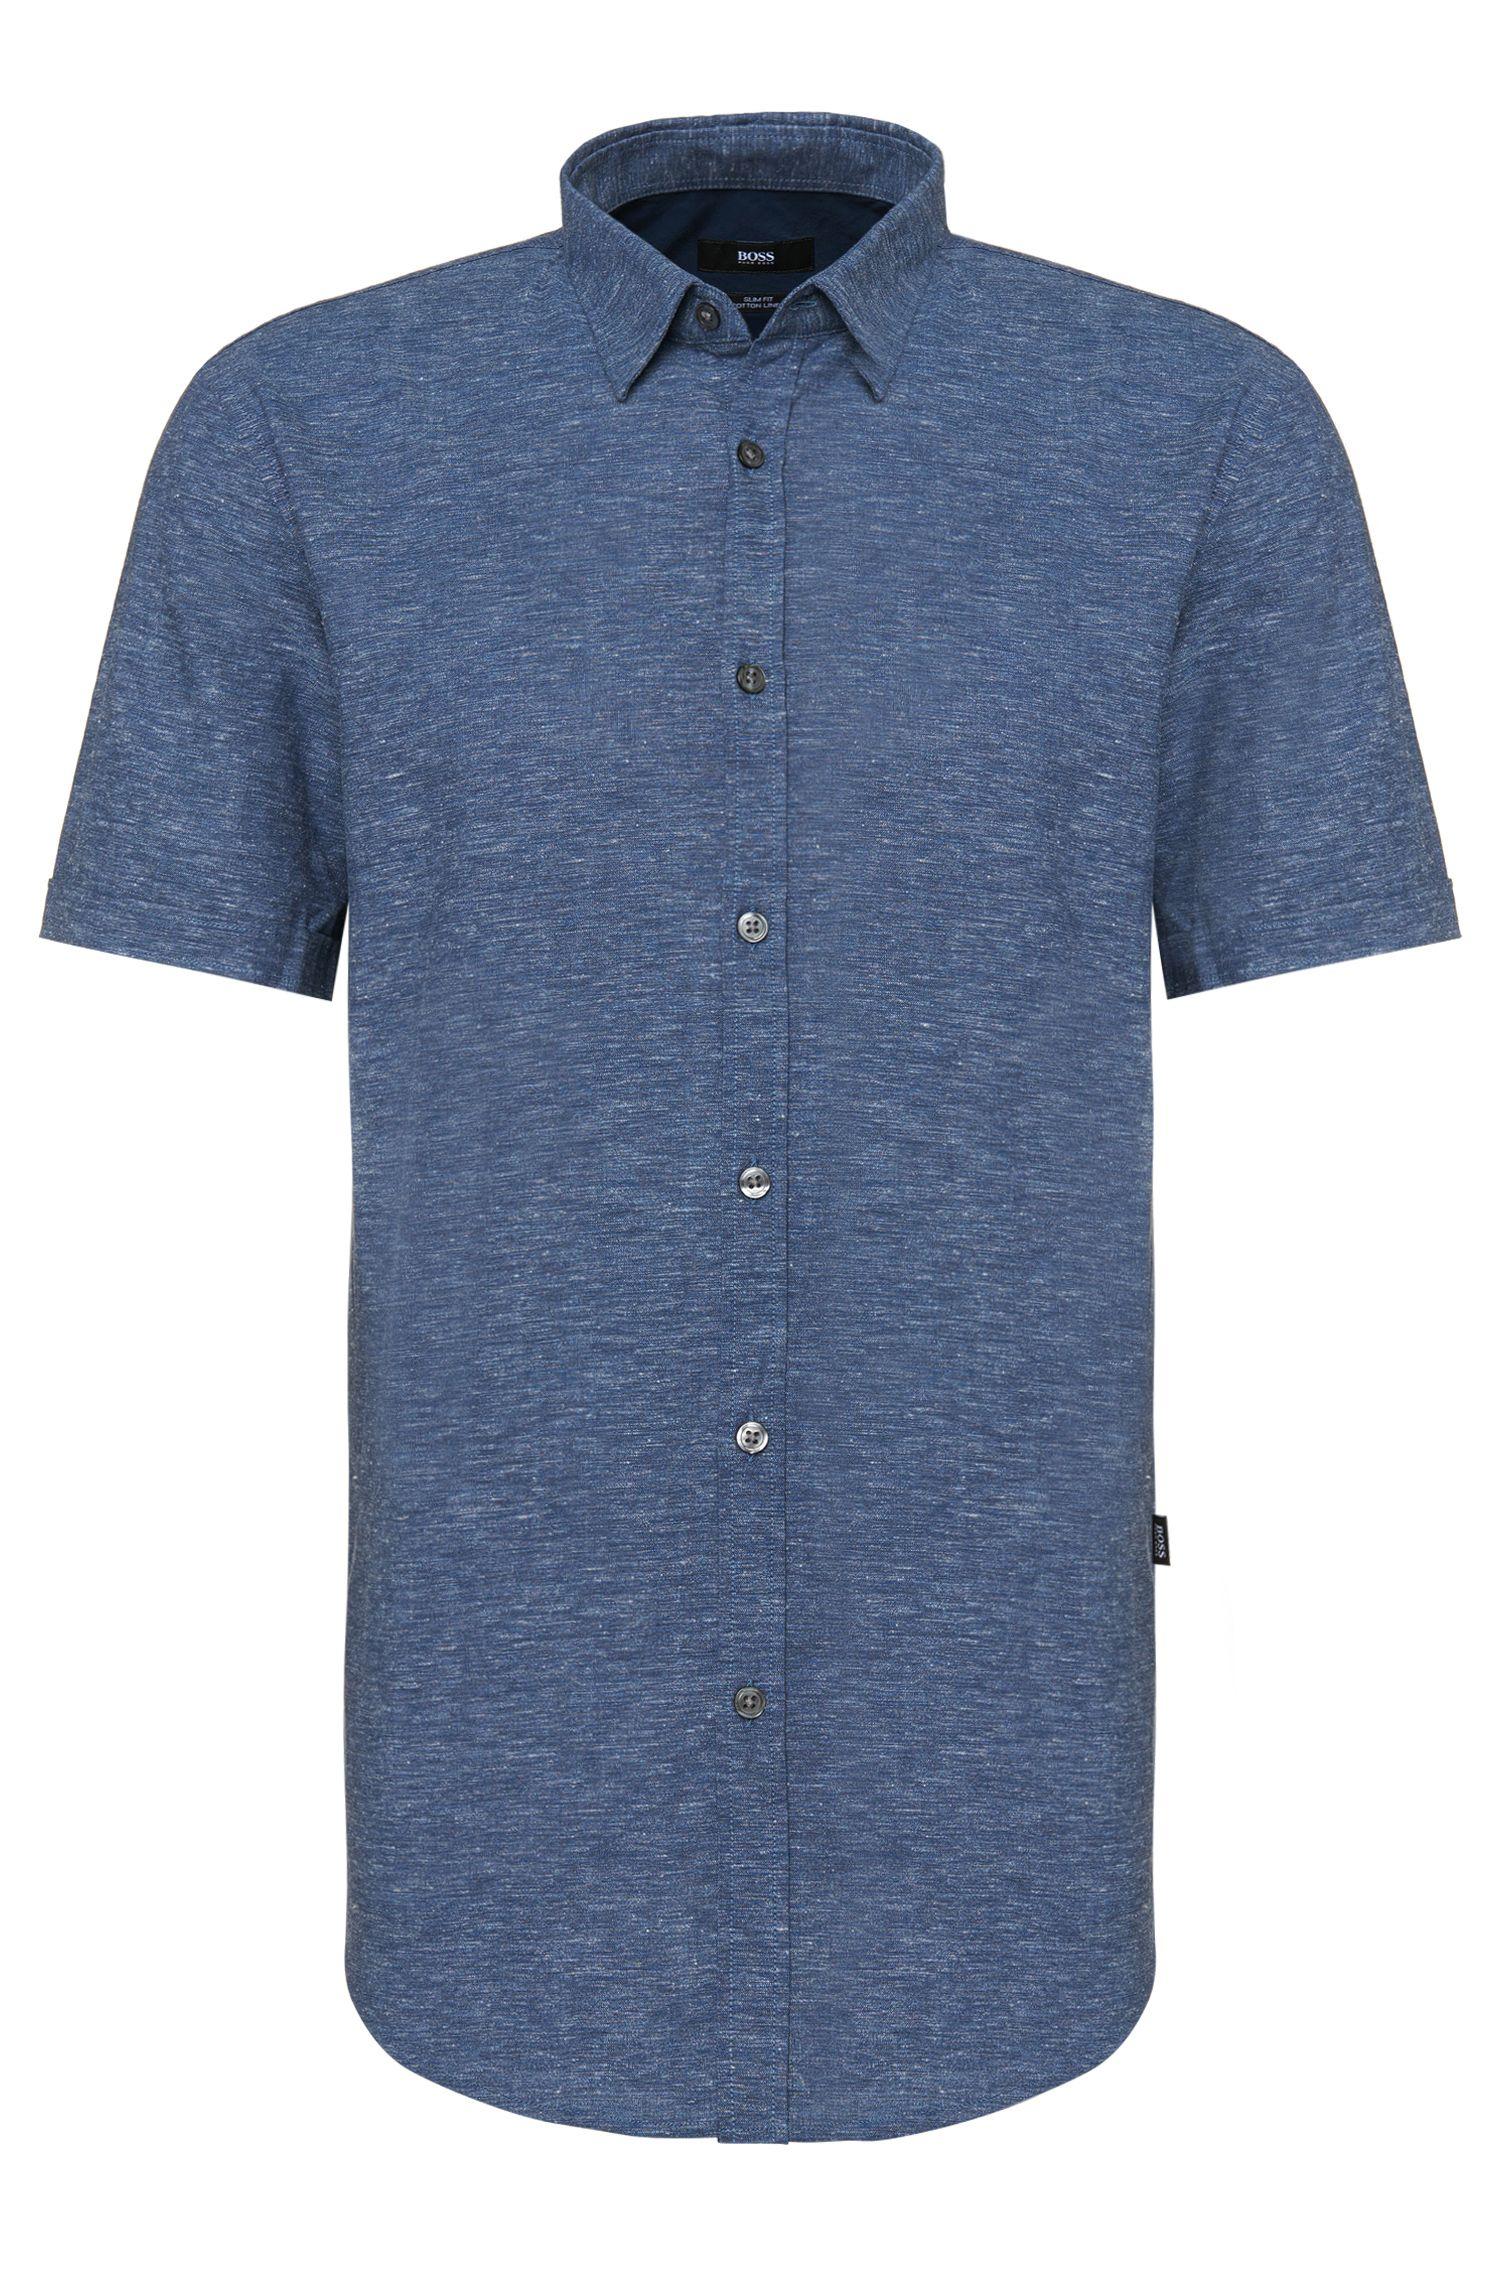 'Ronn' | Slim Fit, Cotton Linen Button Down Shirt